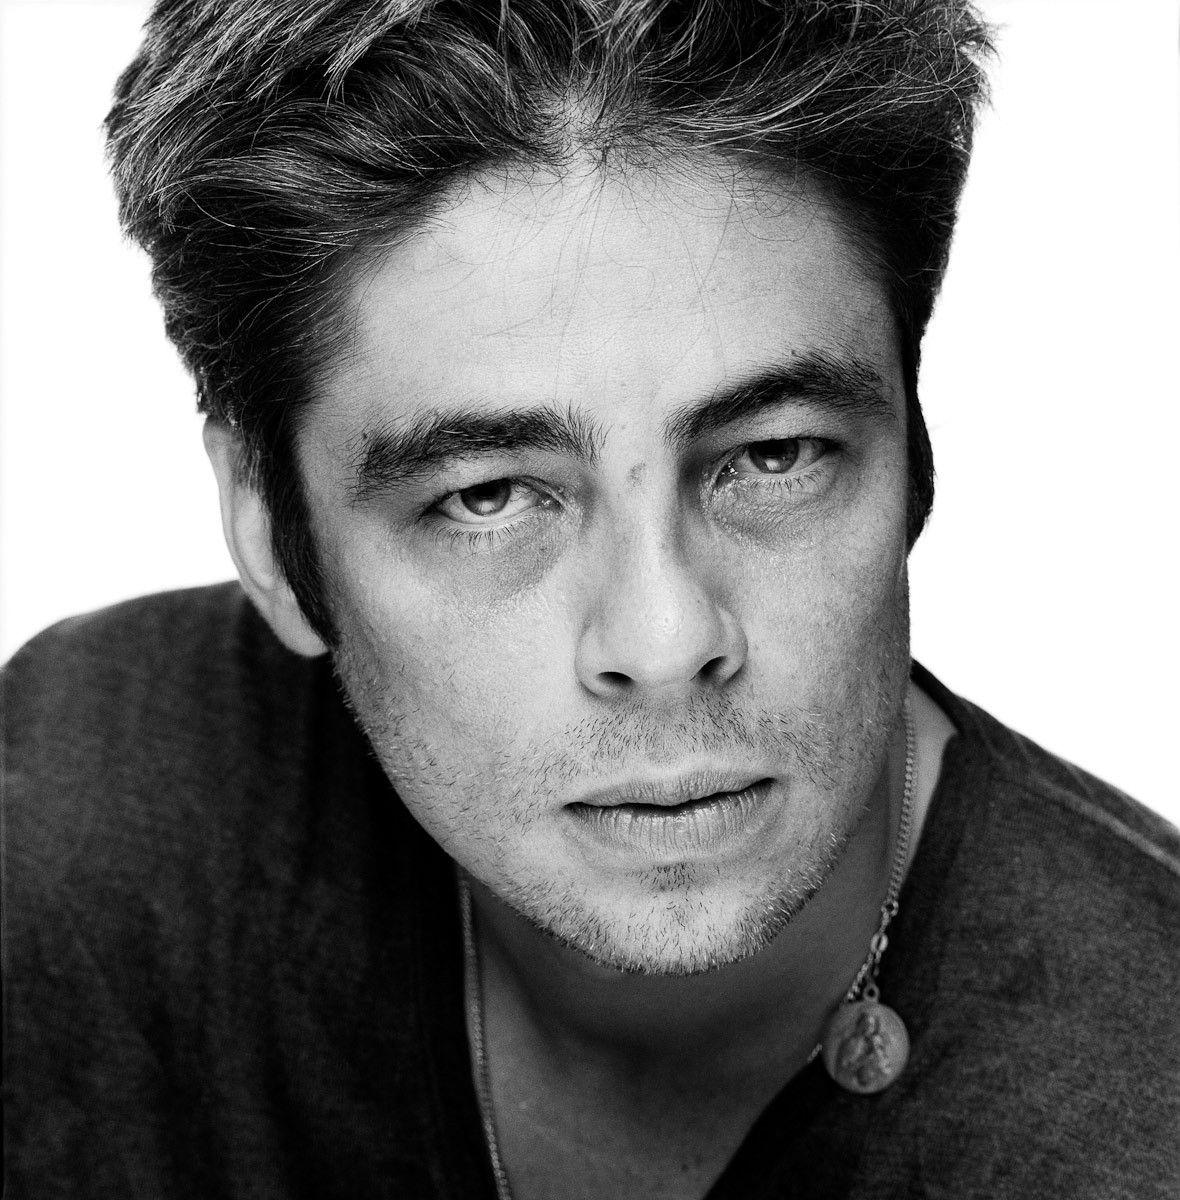 Benicio del Toro, actor